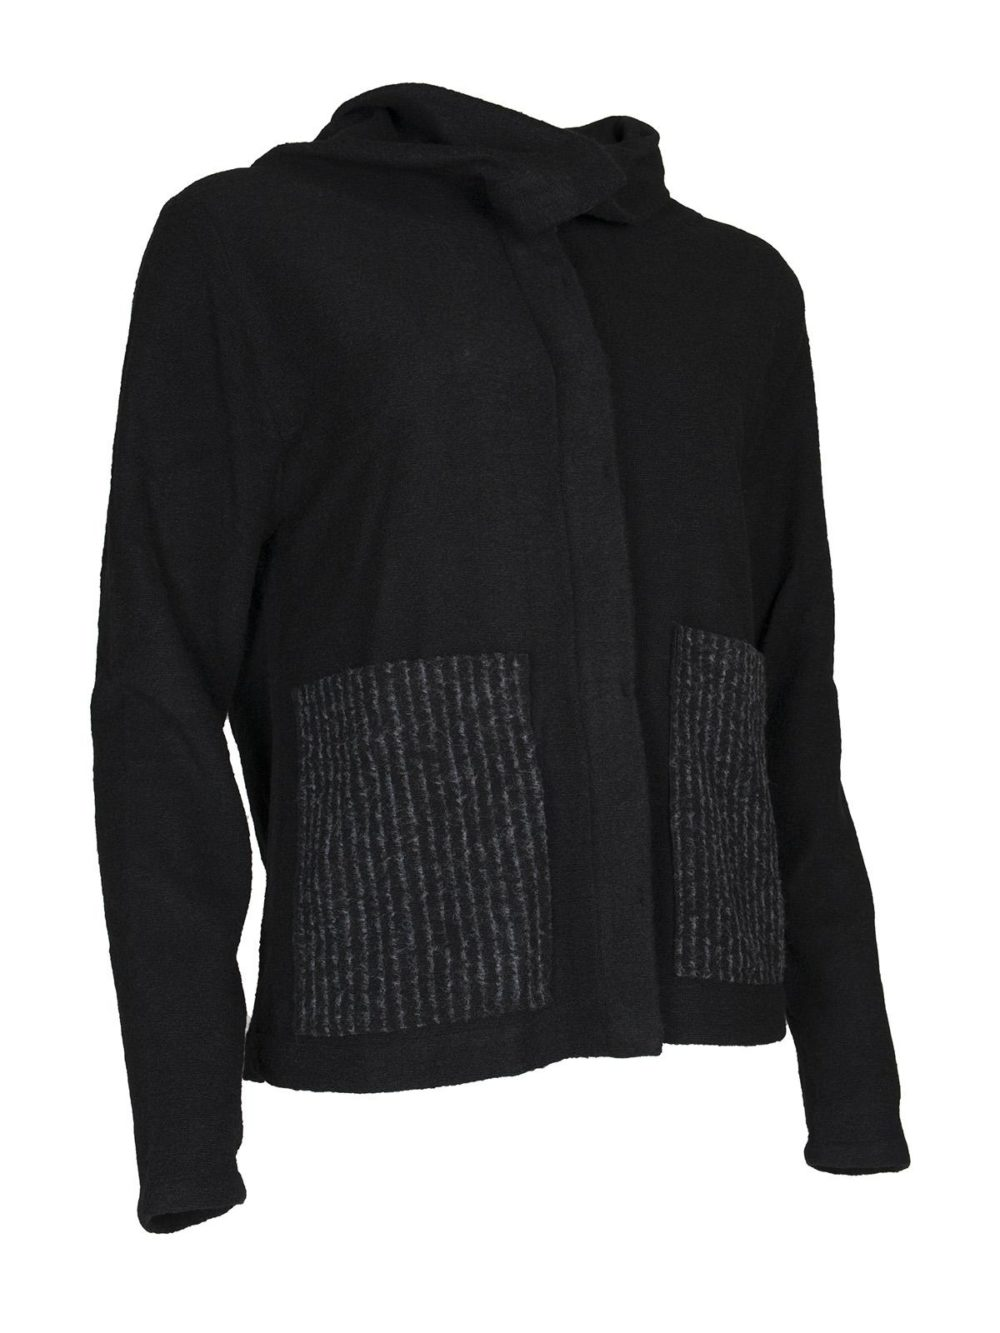 Inuya jacket Kokomarina Women's Clothing Women's jackets